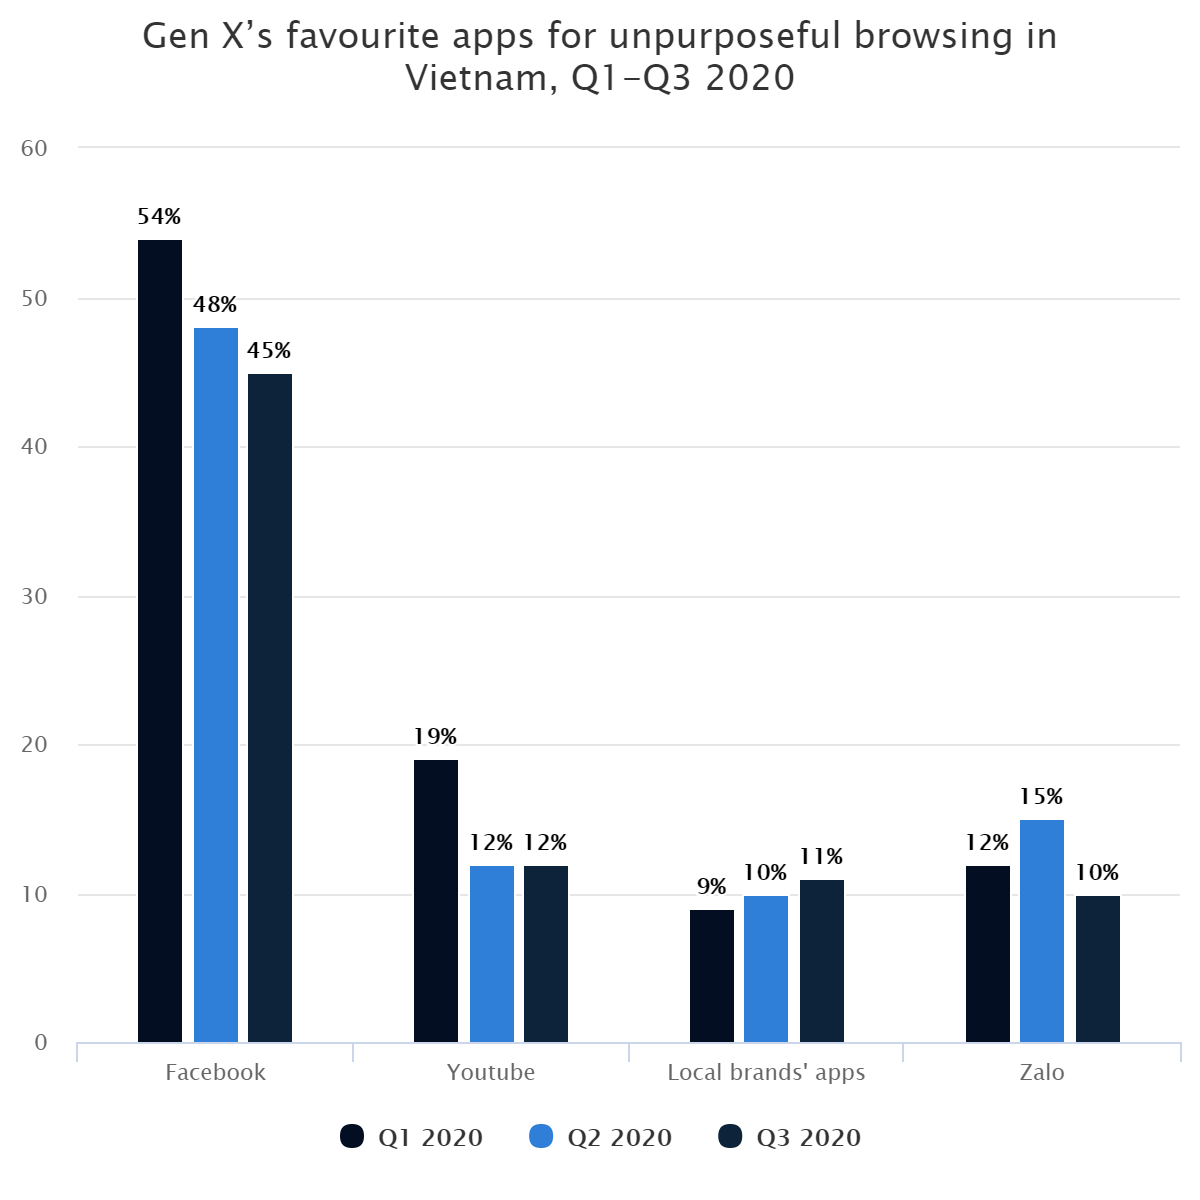 Gen X's favourite apps for unpurposeful browsing in Vietnam, Q1-Q3 2020